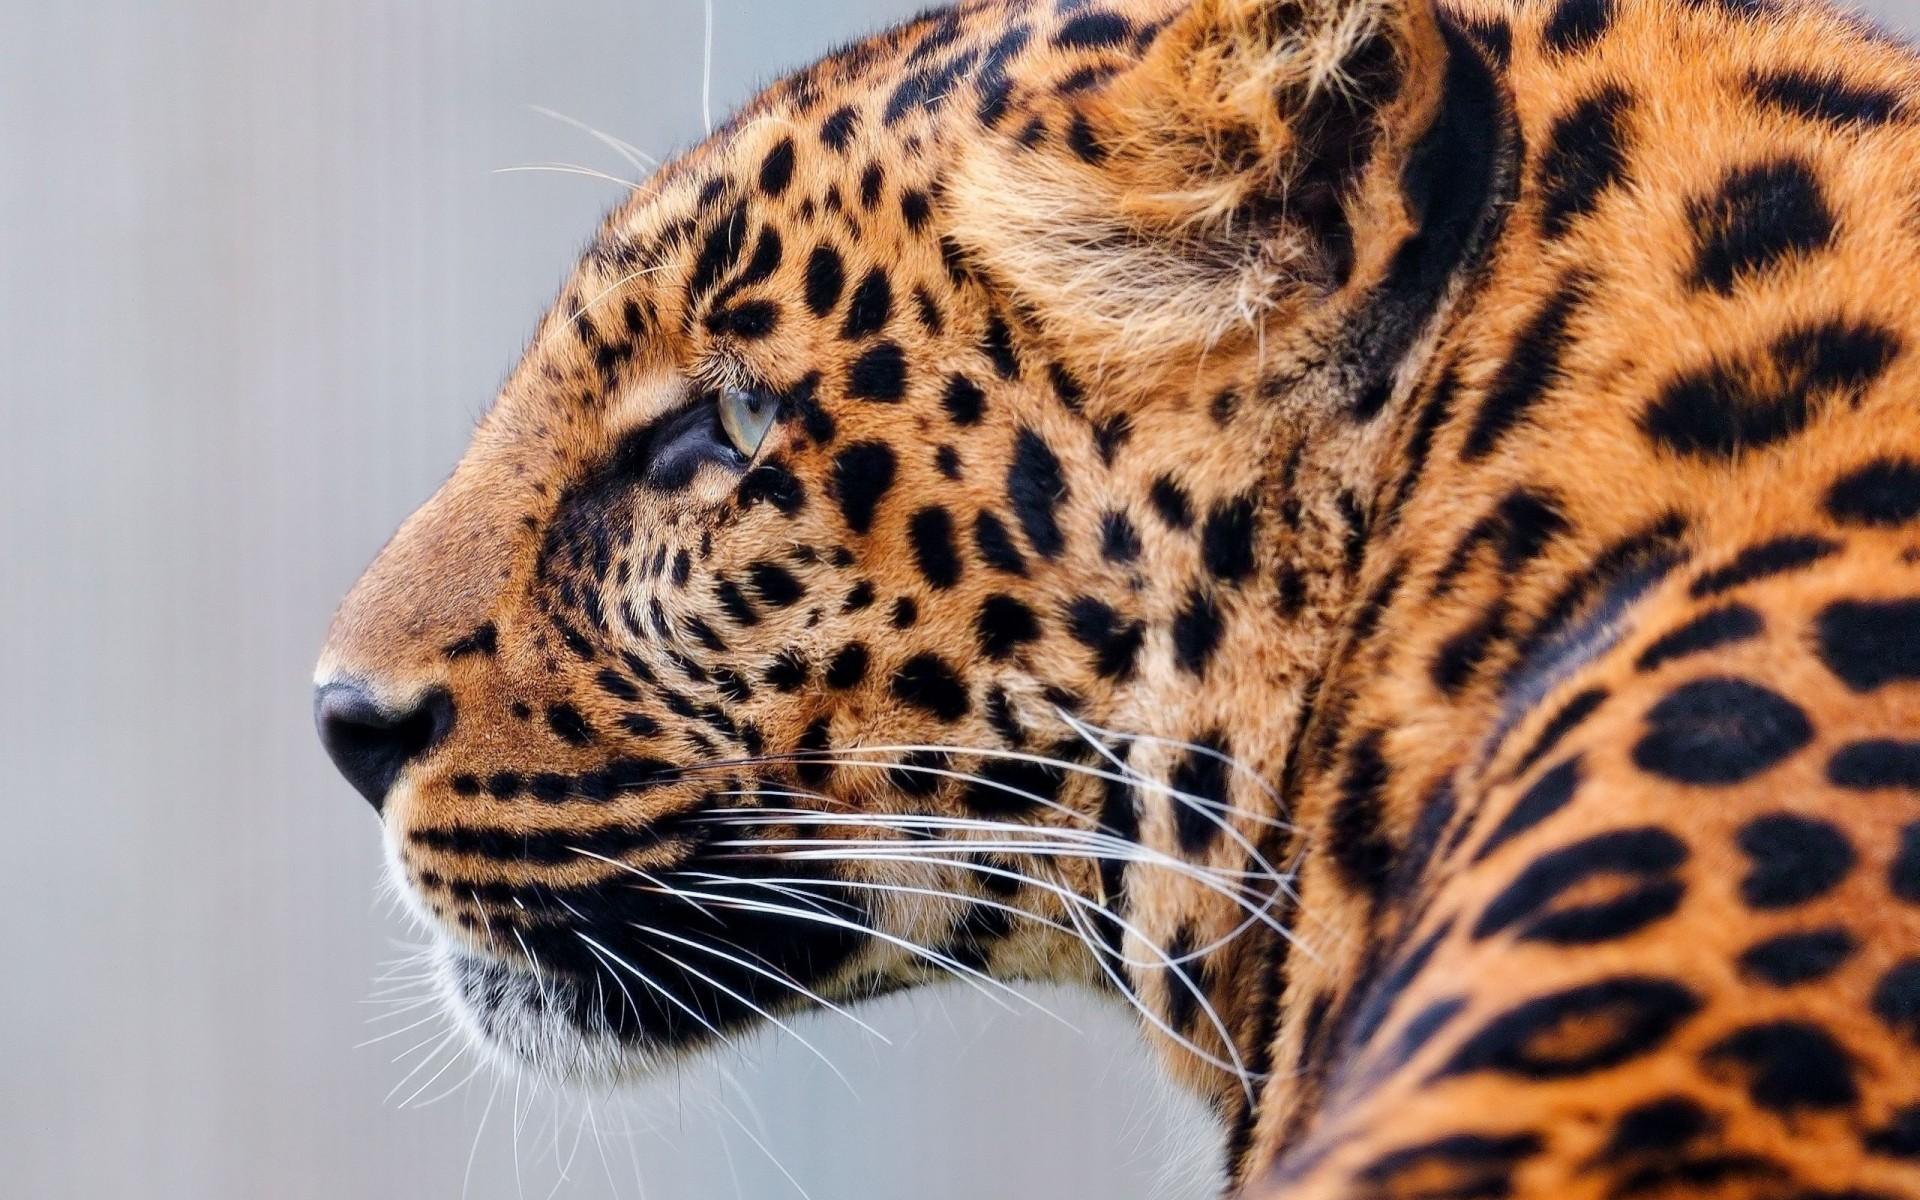 Крутые картинки леопардов, нежного утра мужчине